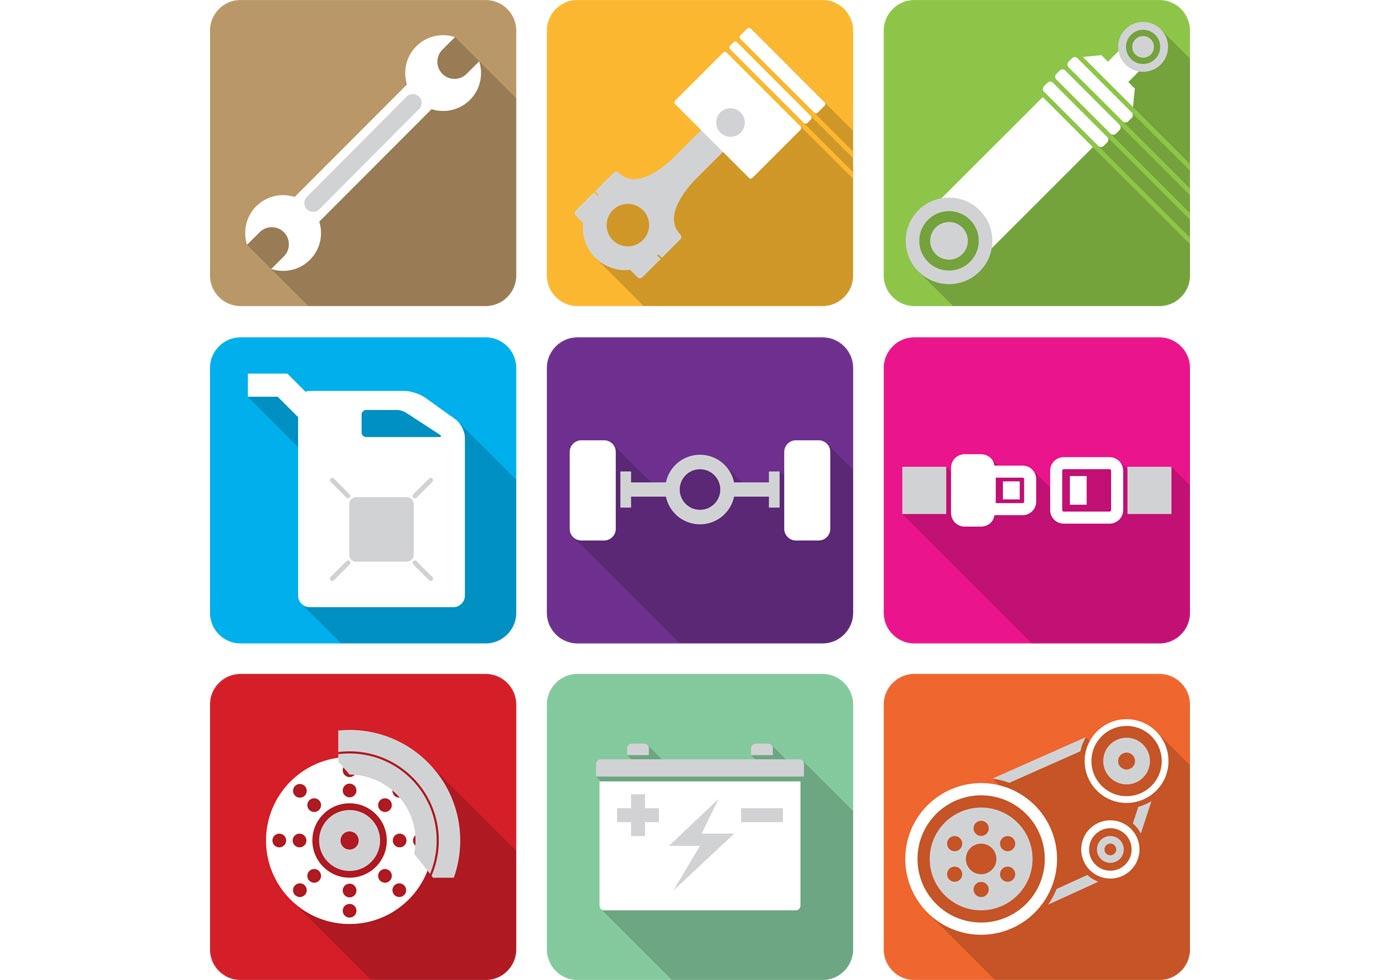 Flat Engine Piston Icons Download Free Vector Art Stock